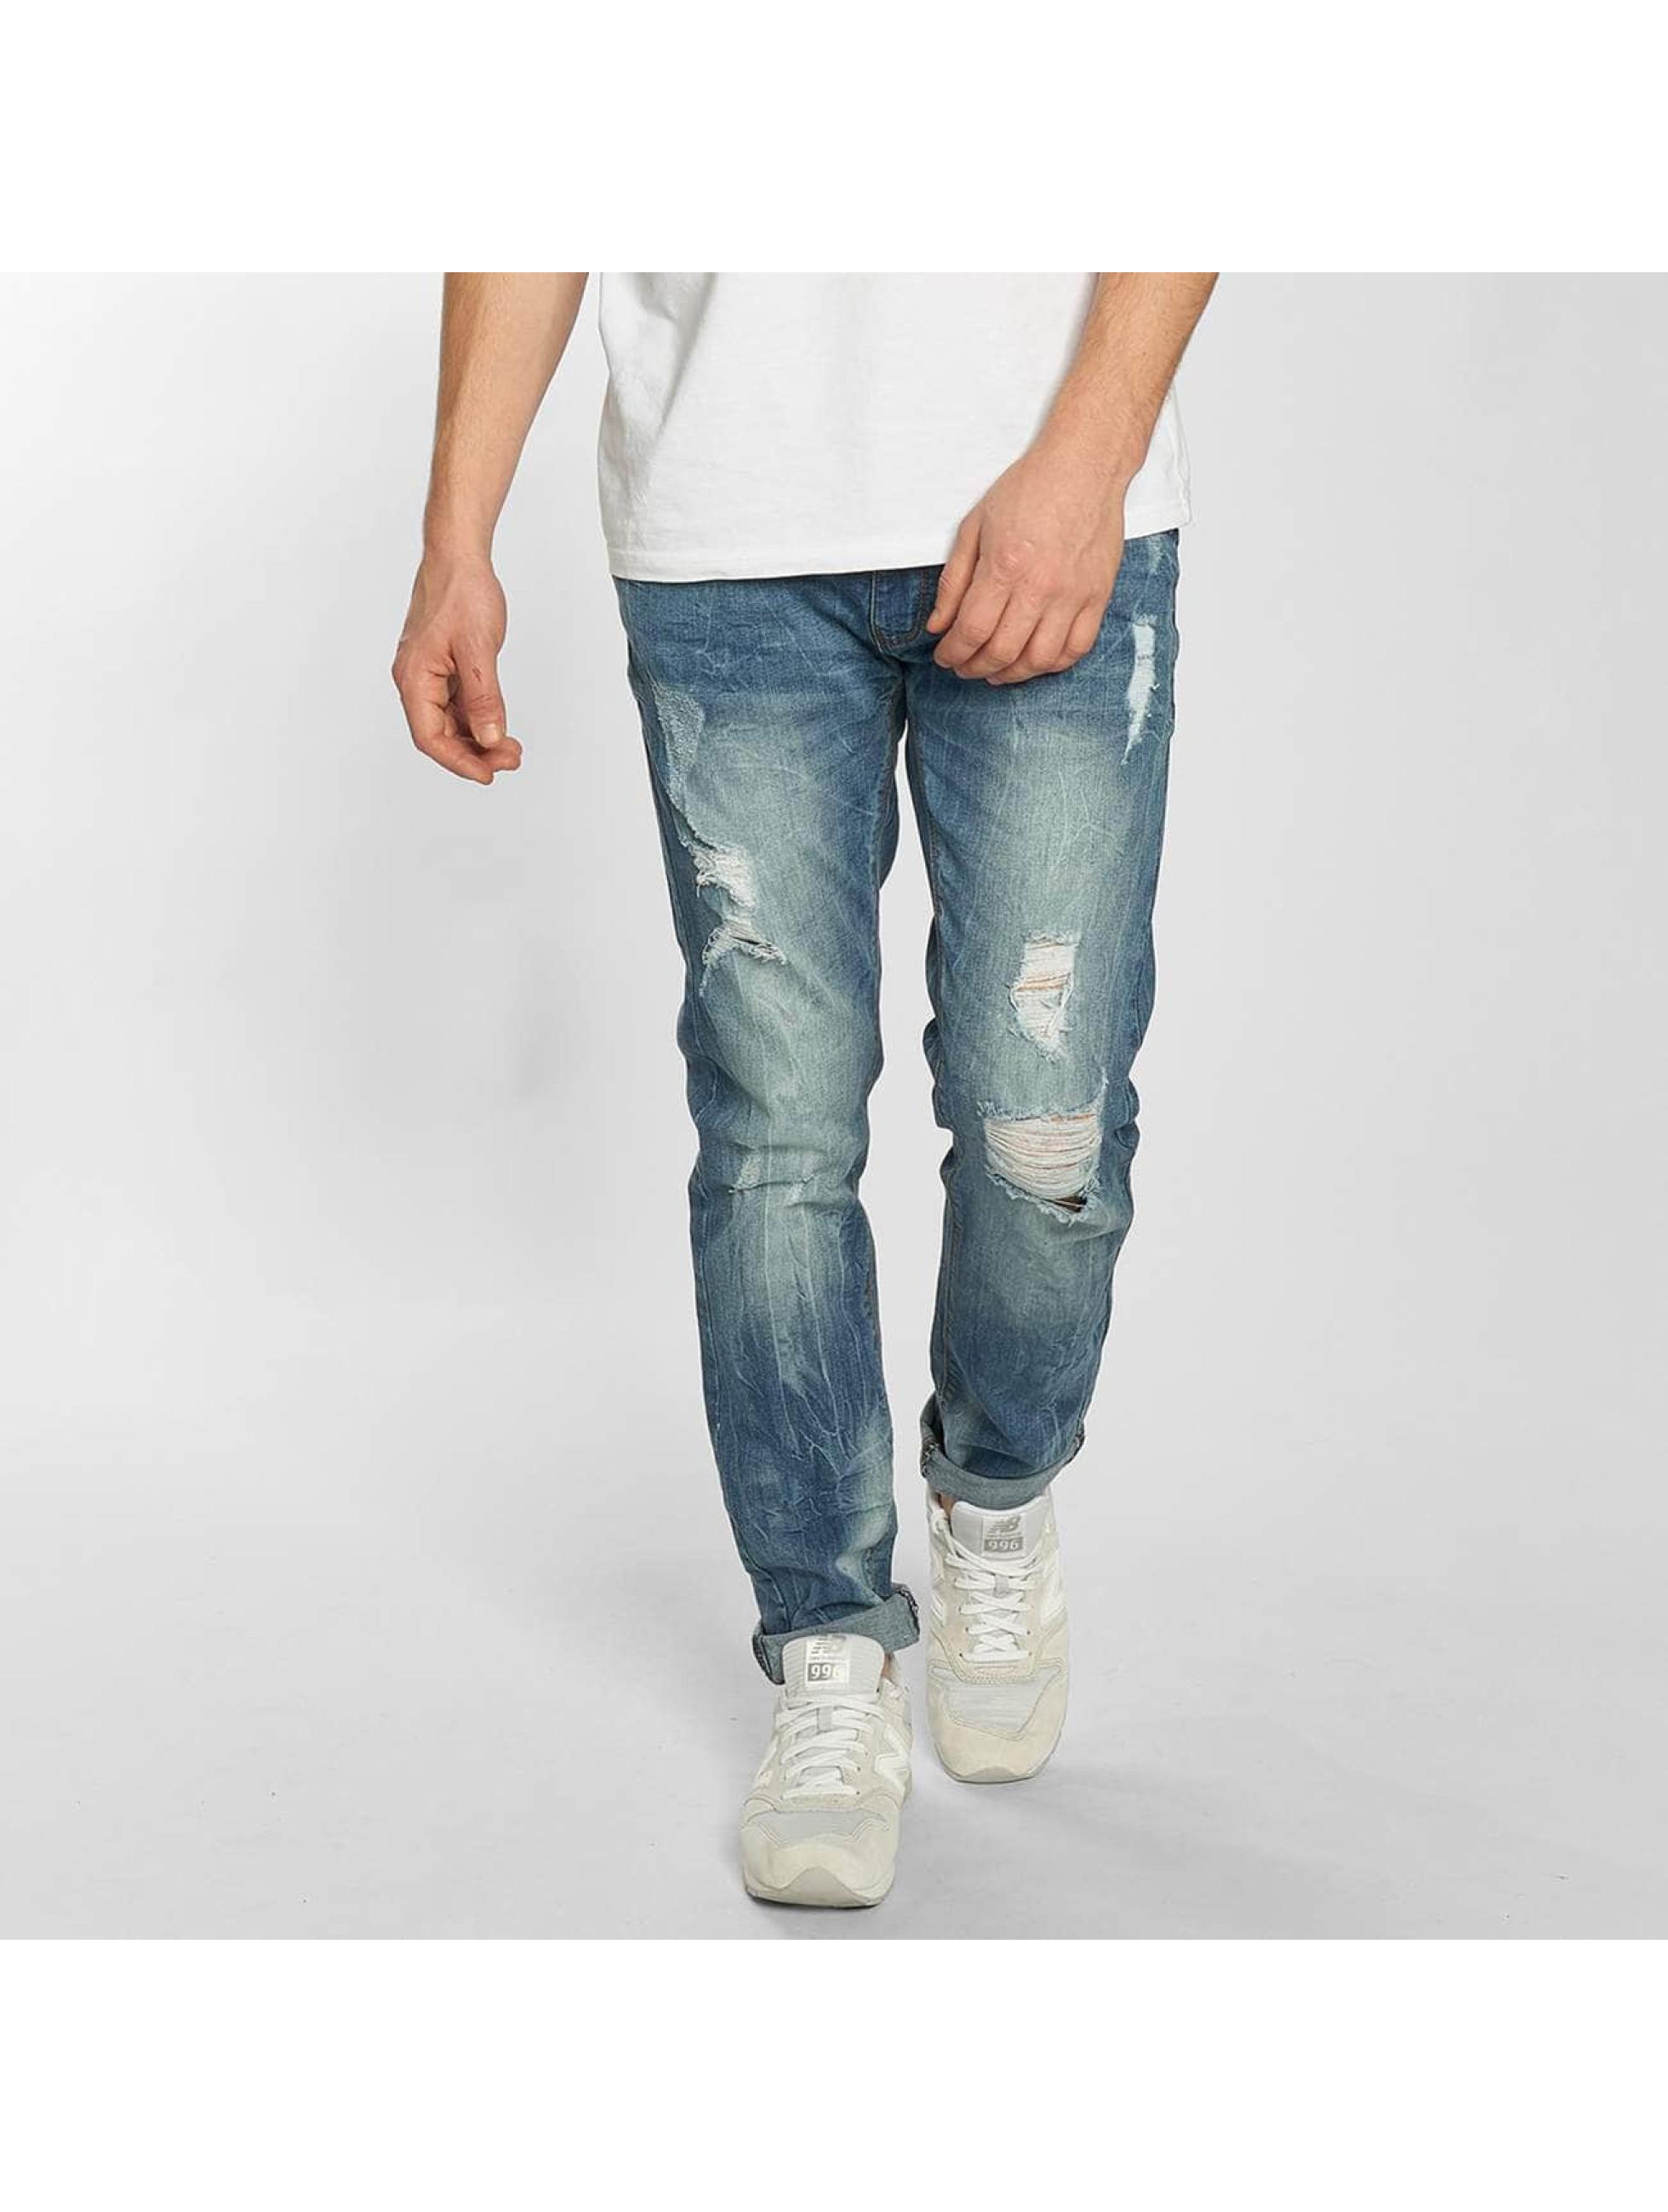 SHINE Original Männer Straight Fit Jeans Destroy in blau Sale Angebote Laubsdorf